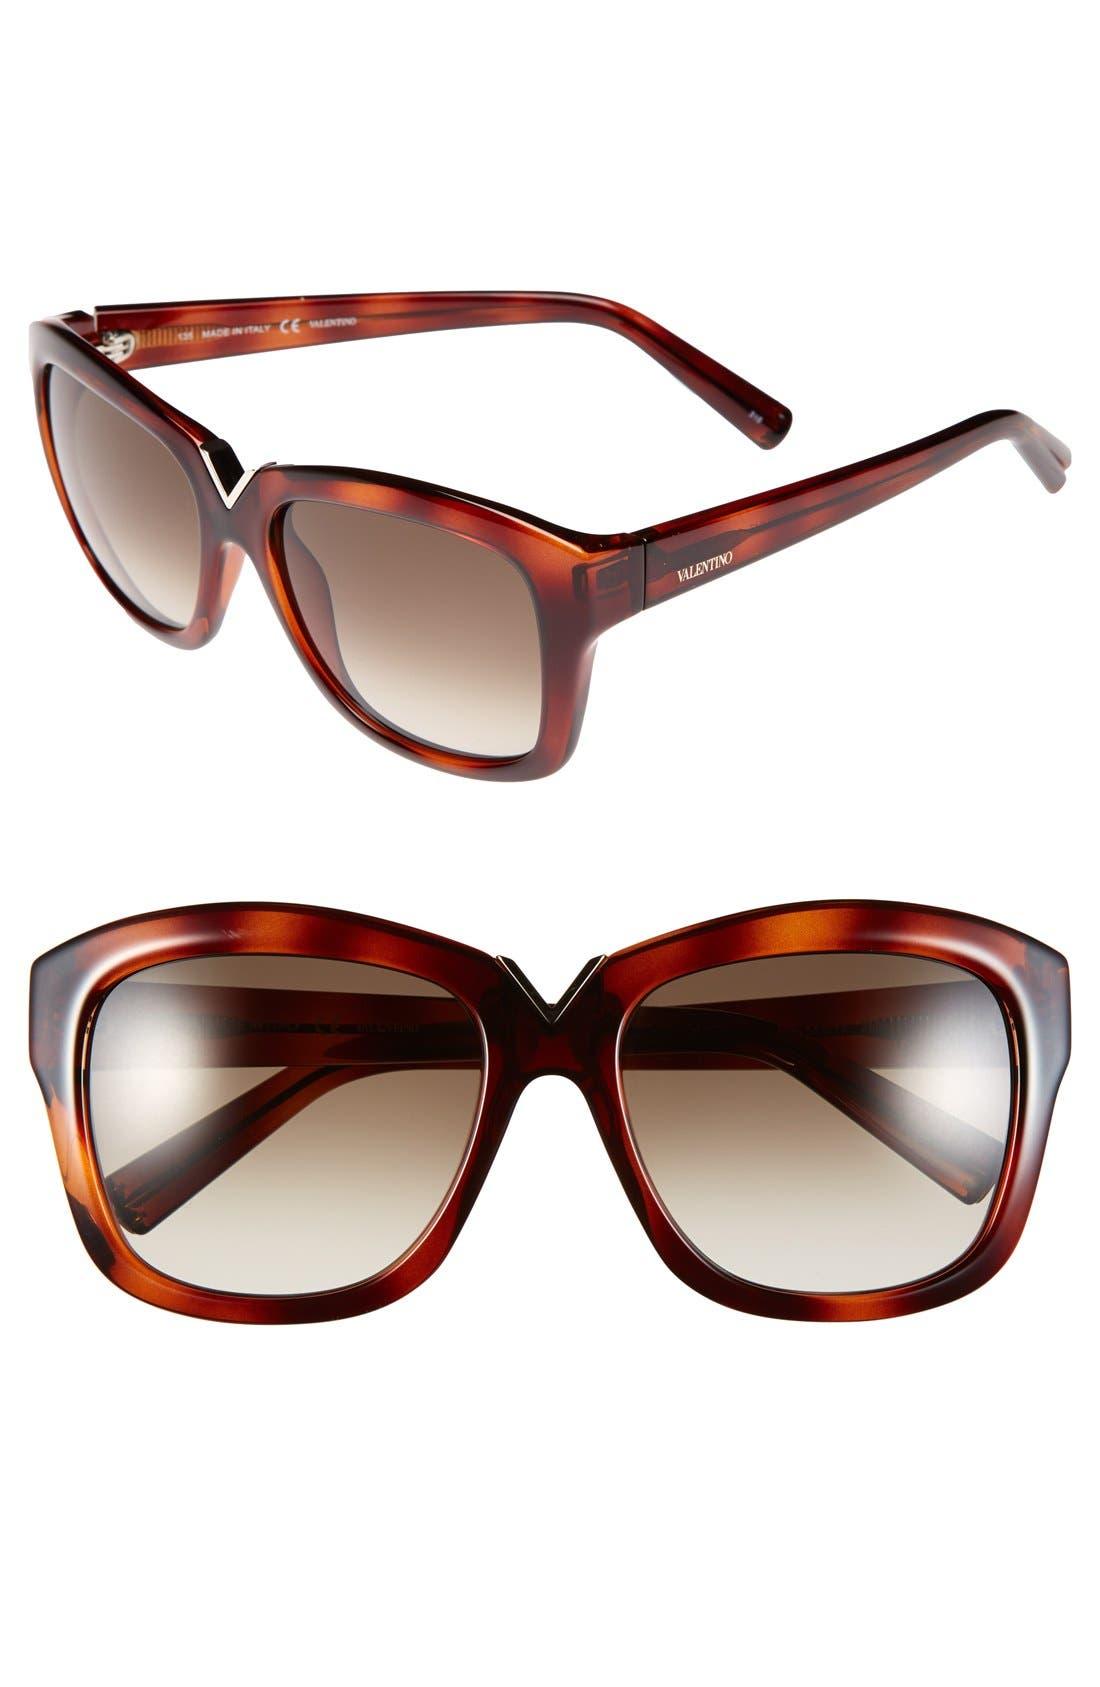 Alternate Image 1 Selected - Valentino 55mm Retro Sunglasses